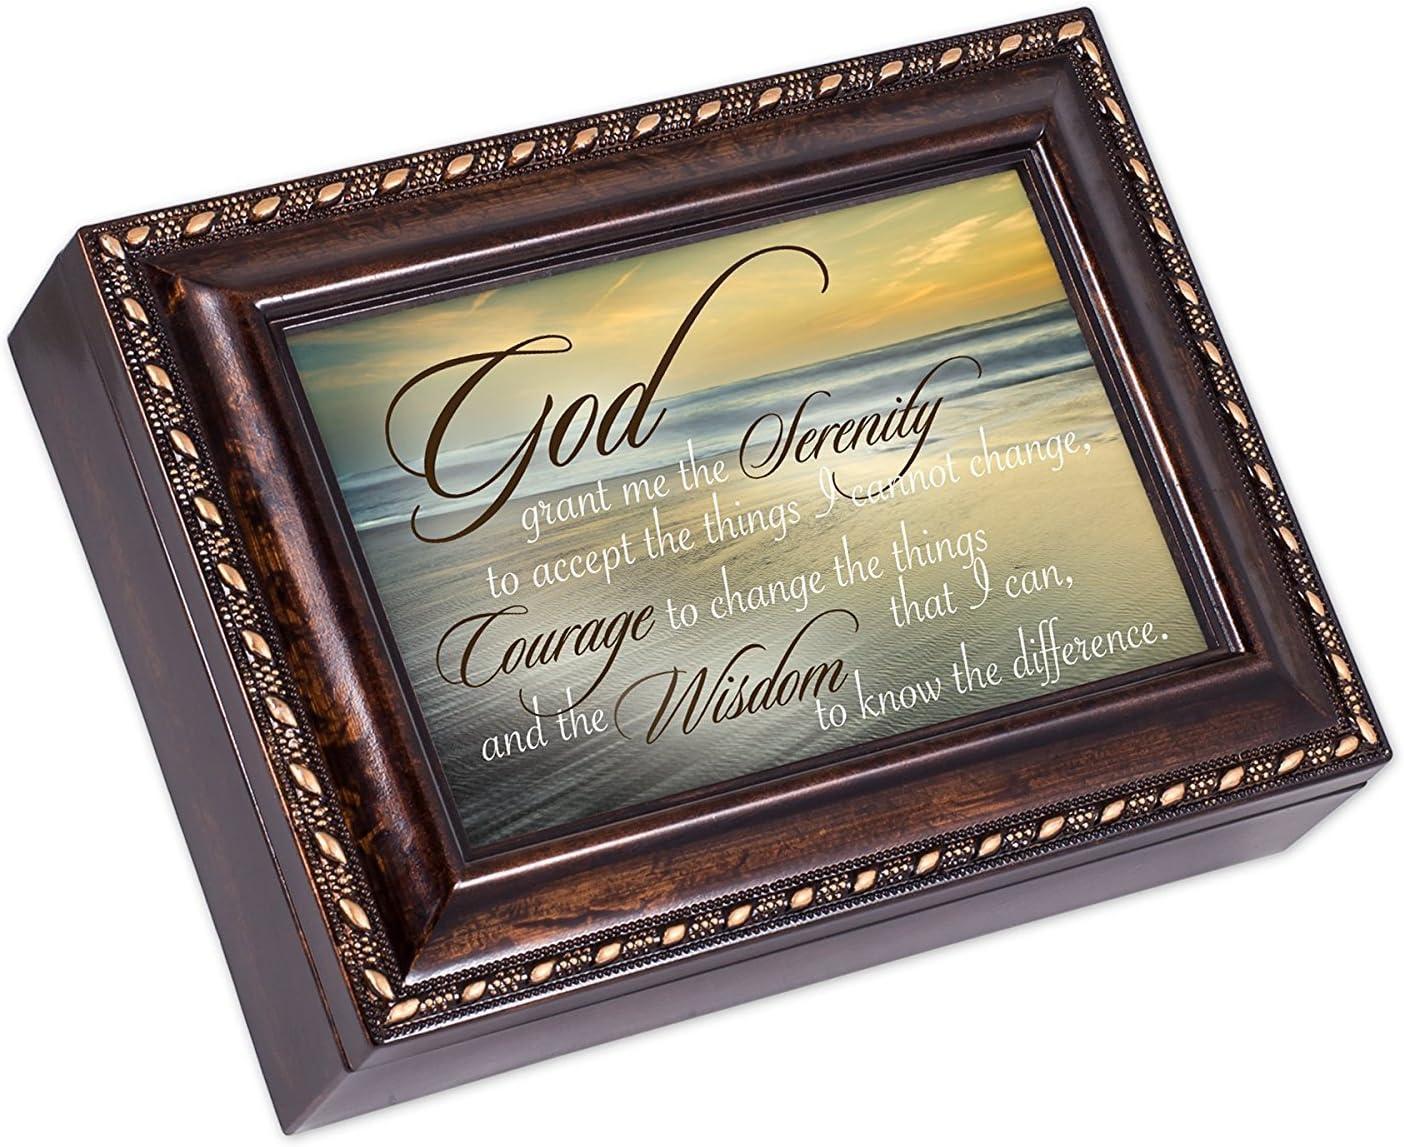 Cottage Garden Serenity Prayer Ocean Waves Burlwood Finish Jewelry Music Box Plays Amazing Grace